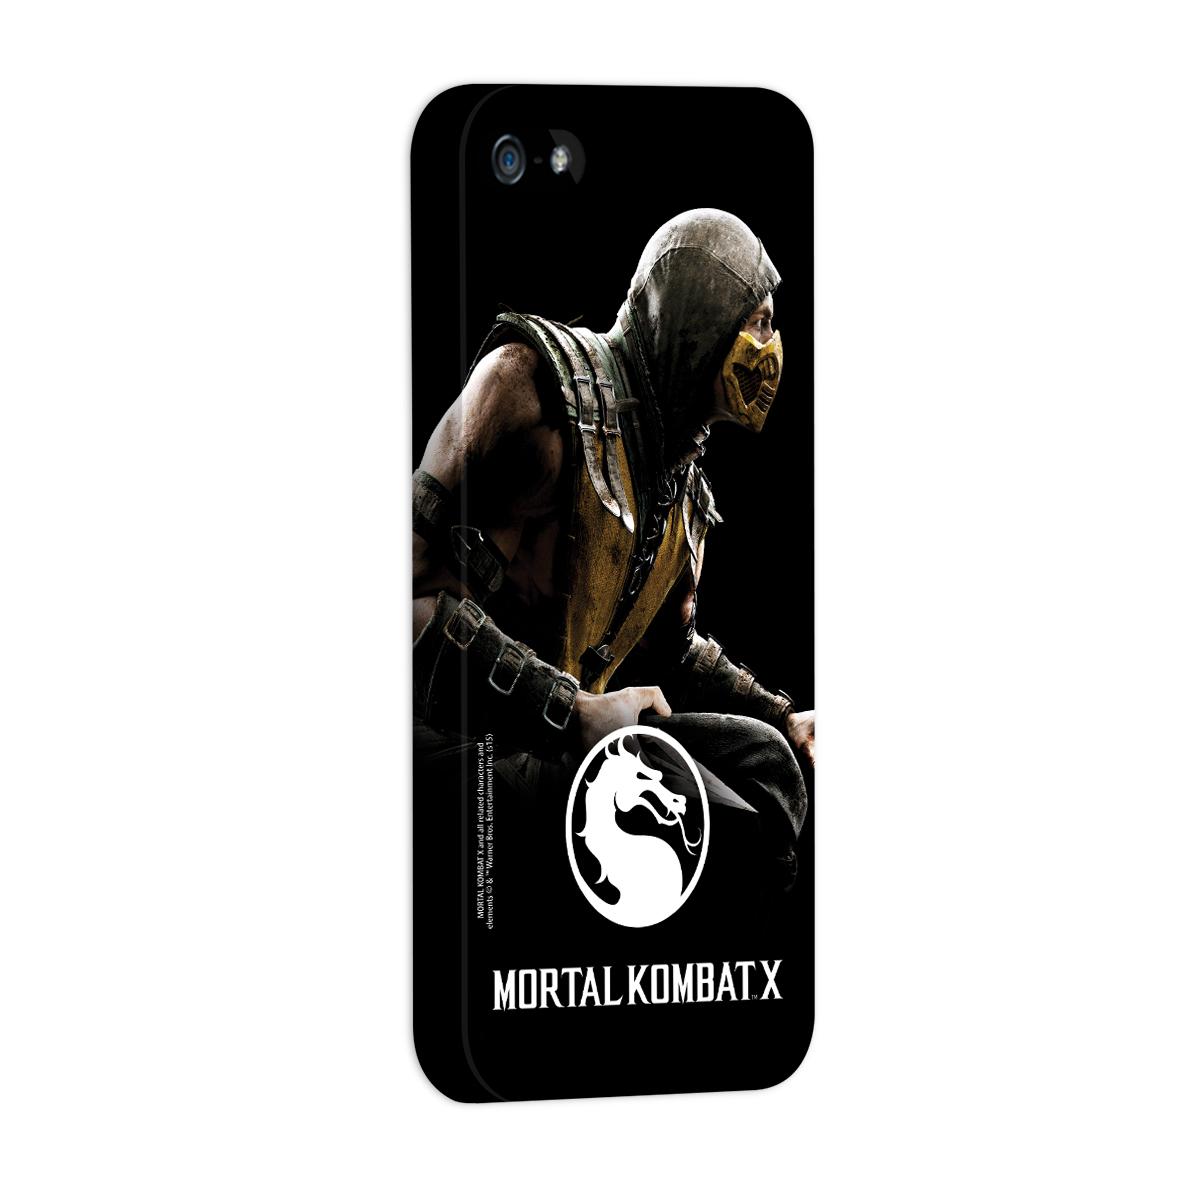 Capa para iPhone 5/5S Mortal Kombat X Capa